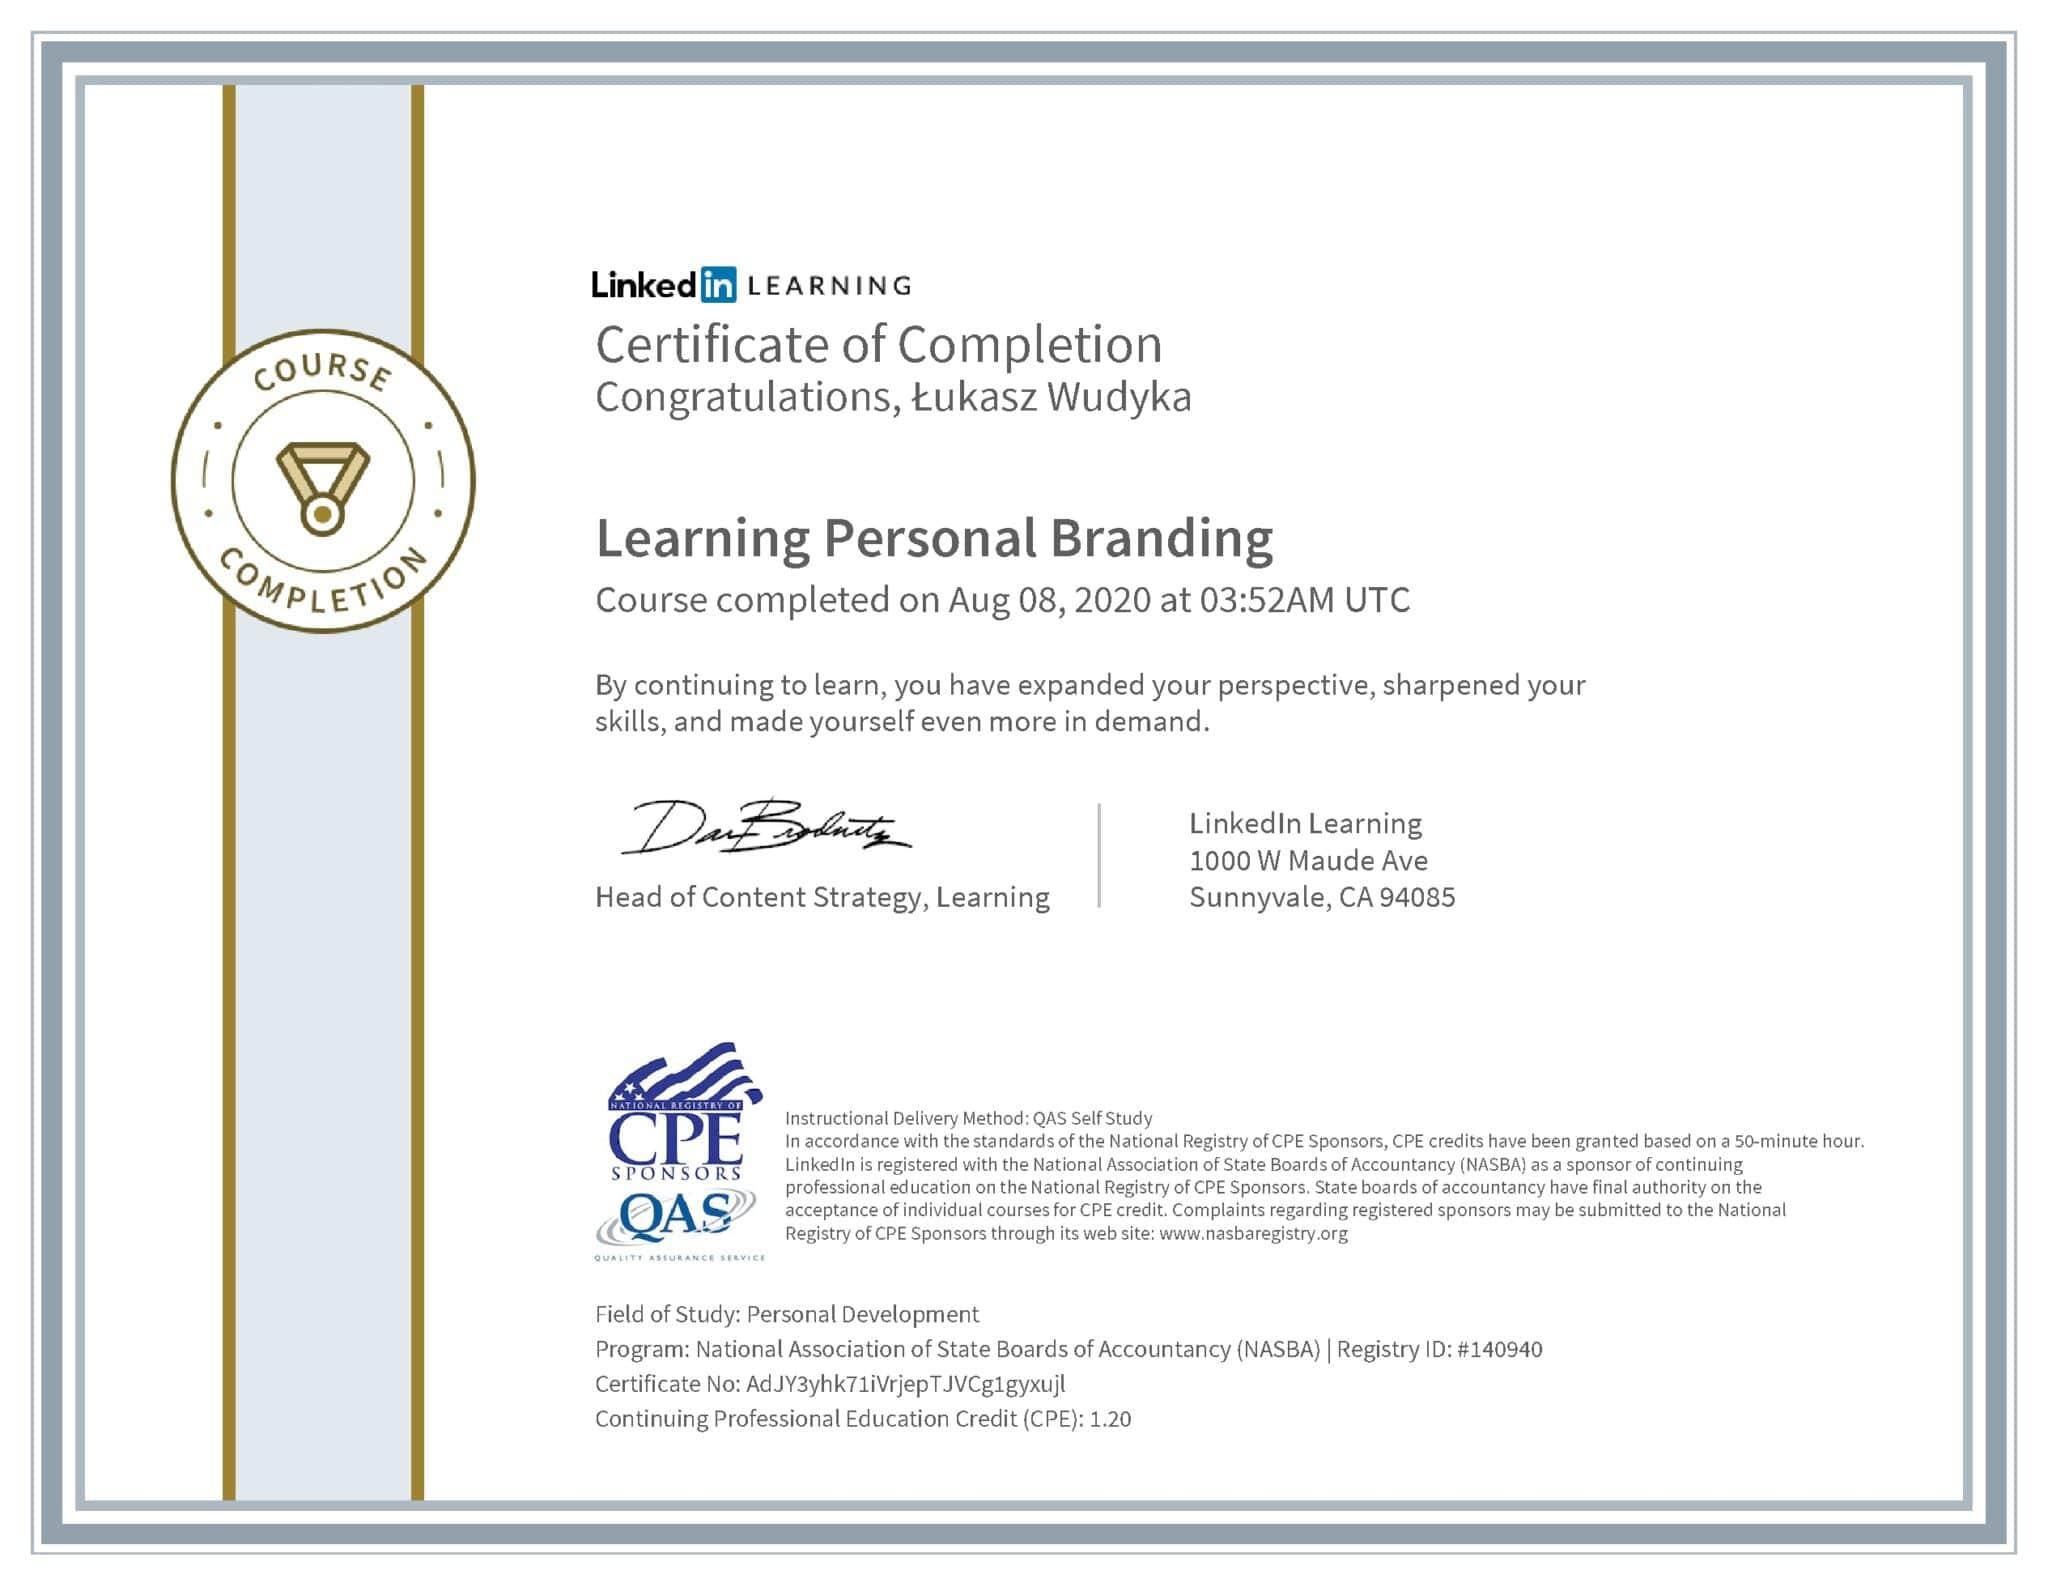 Łukasz Wudyka certyfikat LinkedIn Learning Personal Branding NASBA